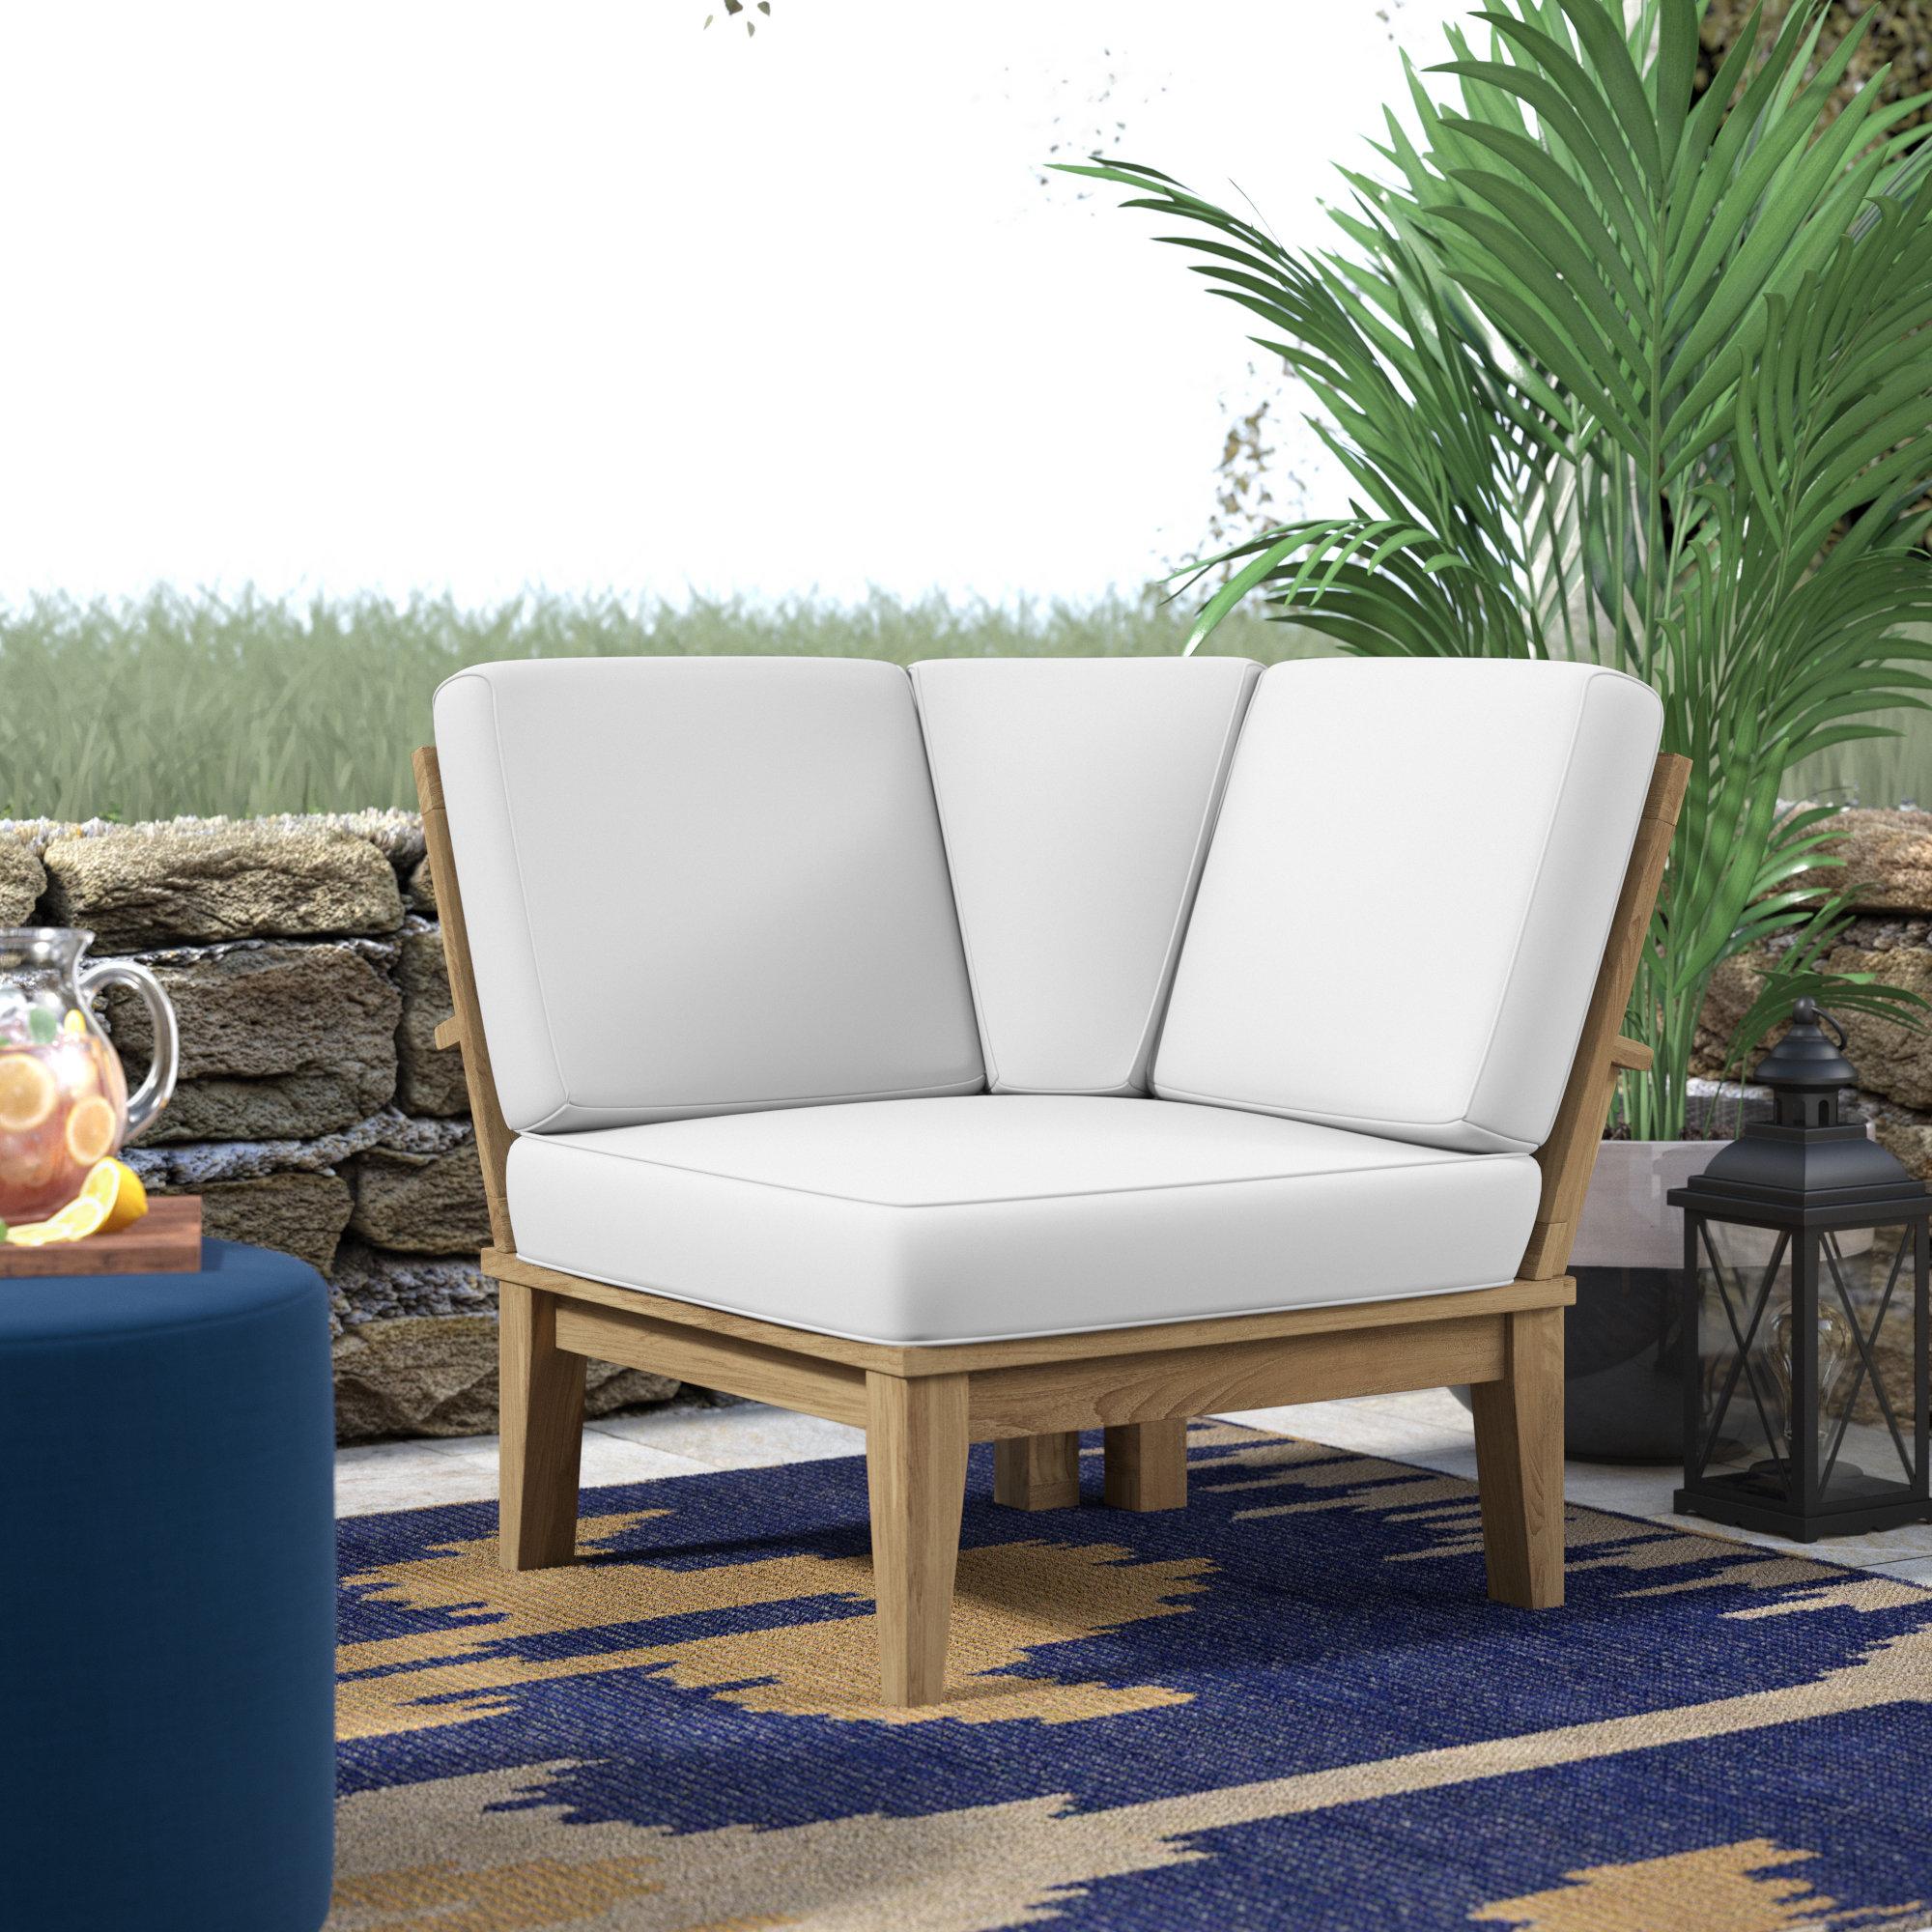 Wayfair With Regard To Elaina Teak Loveseats With Cushions (View 20 of 20)